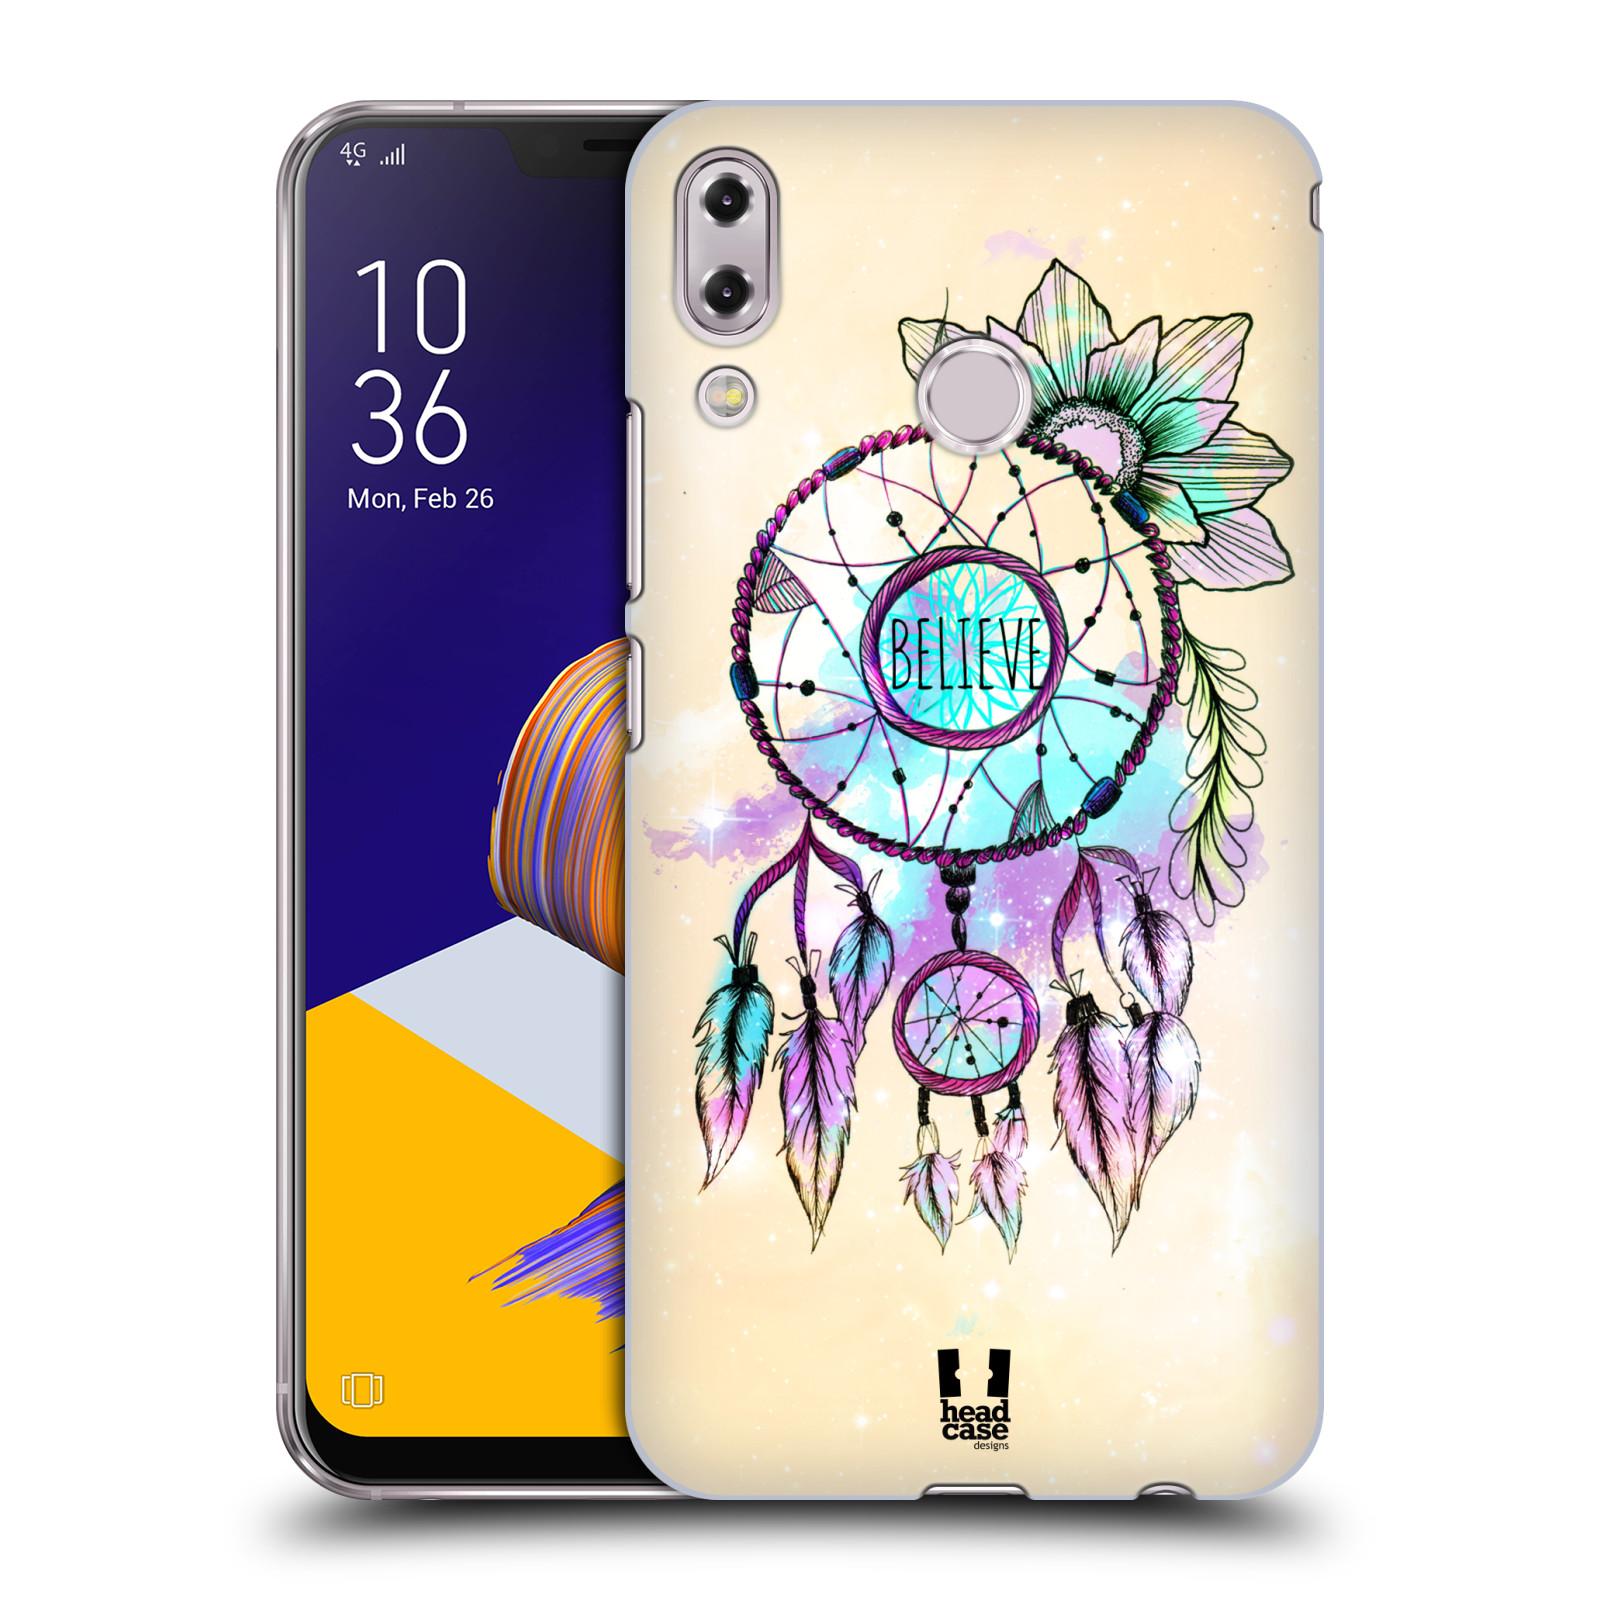 Plastové pouzdro na mobil Asus Zenfone 5z ZS620KL - Head Case - MIX BELIEVE